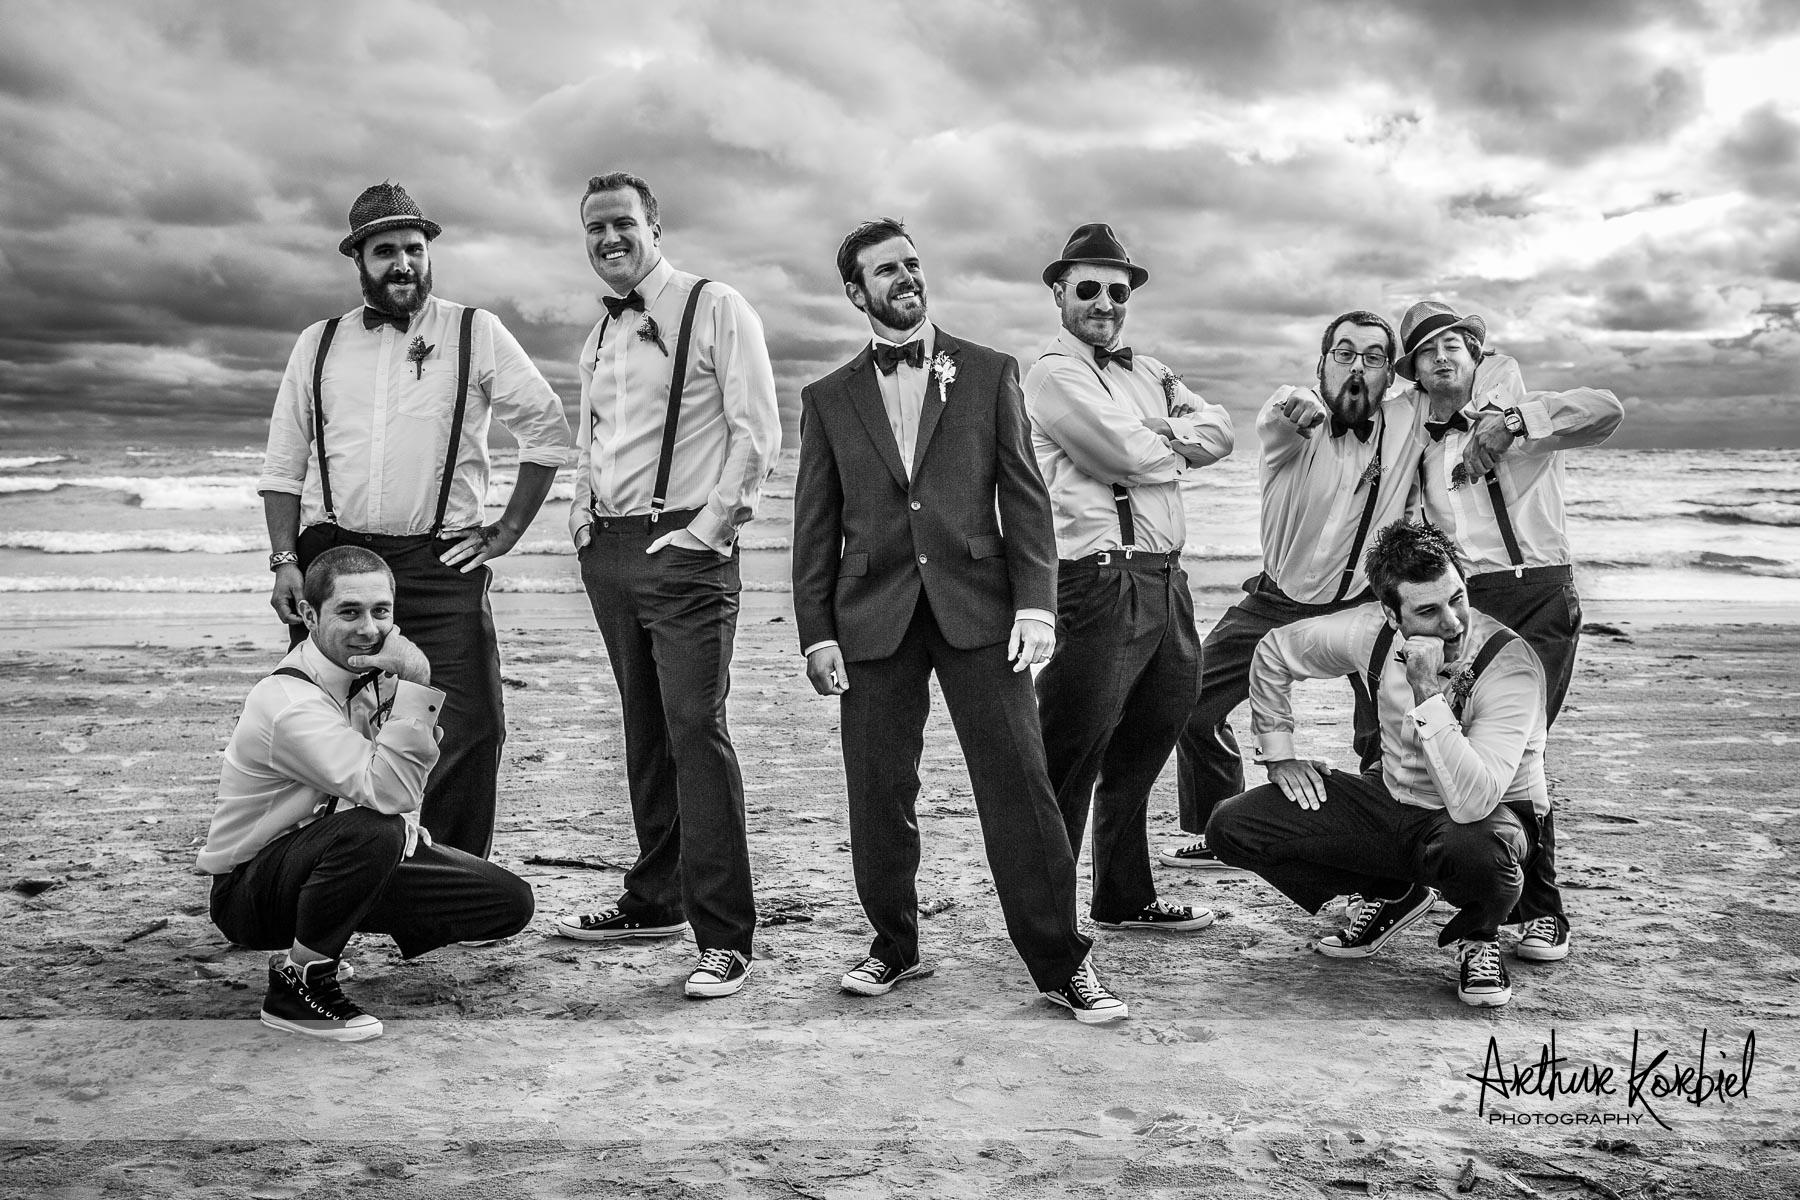 Arthur Korbiel Photography - London Wedding Photographer - Rogers-024.jpg